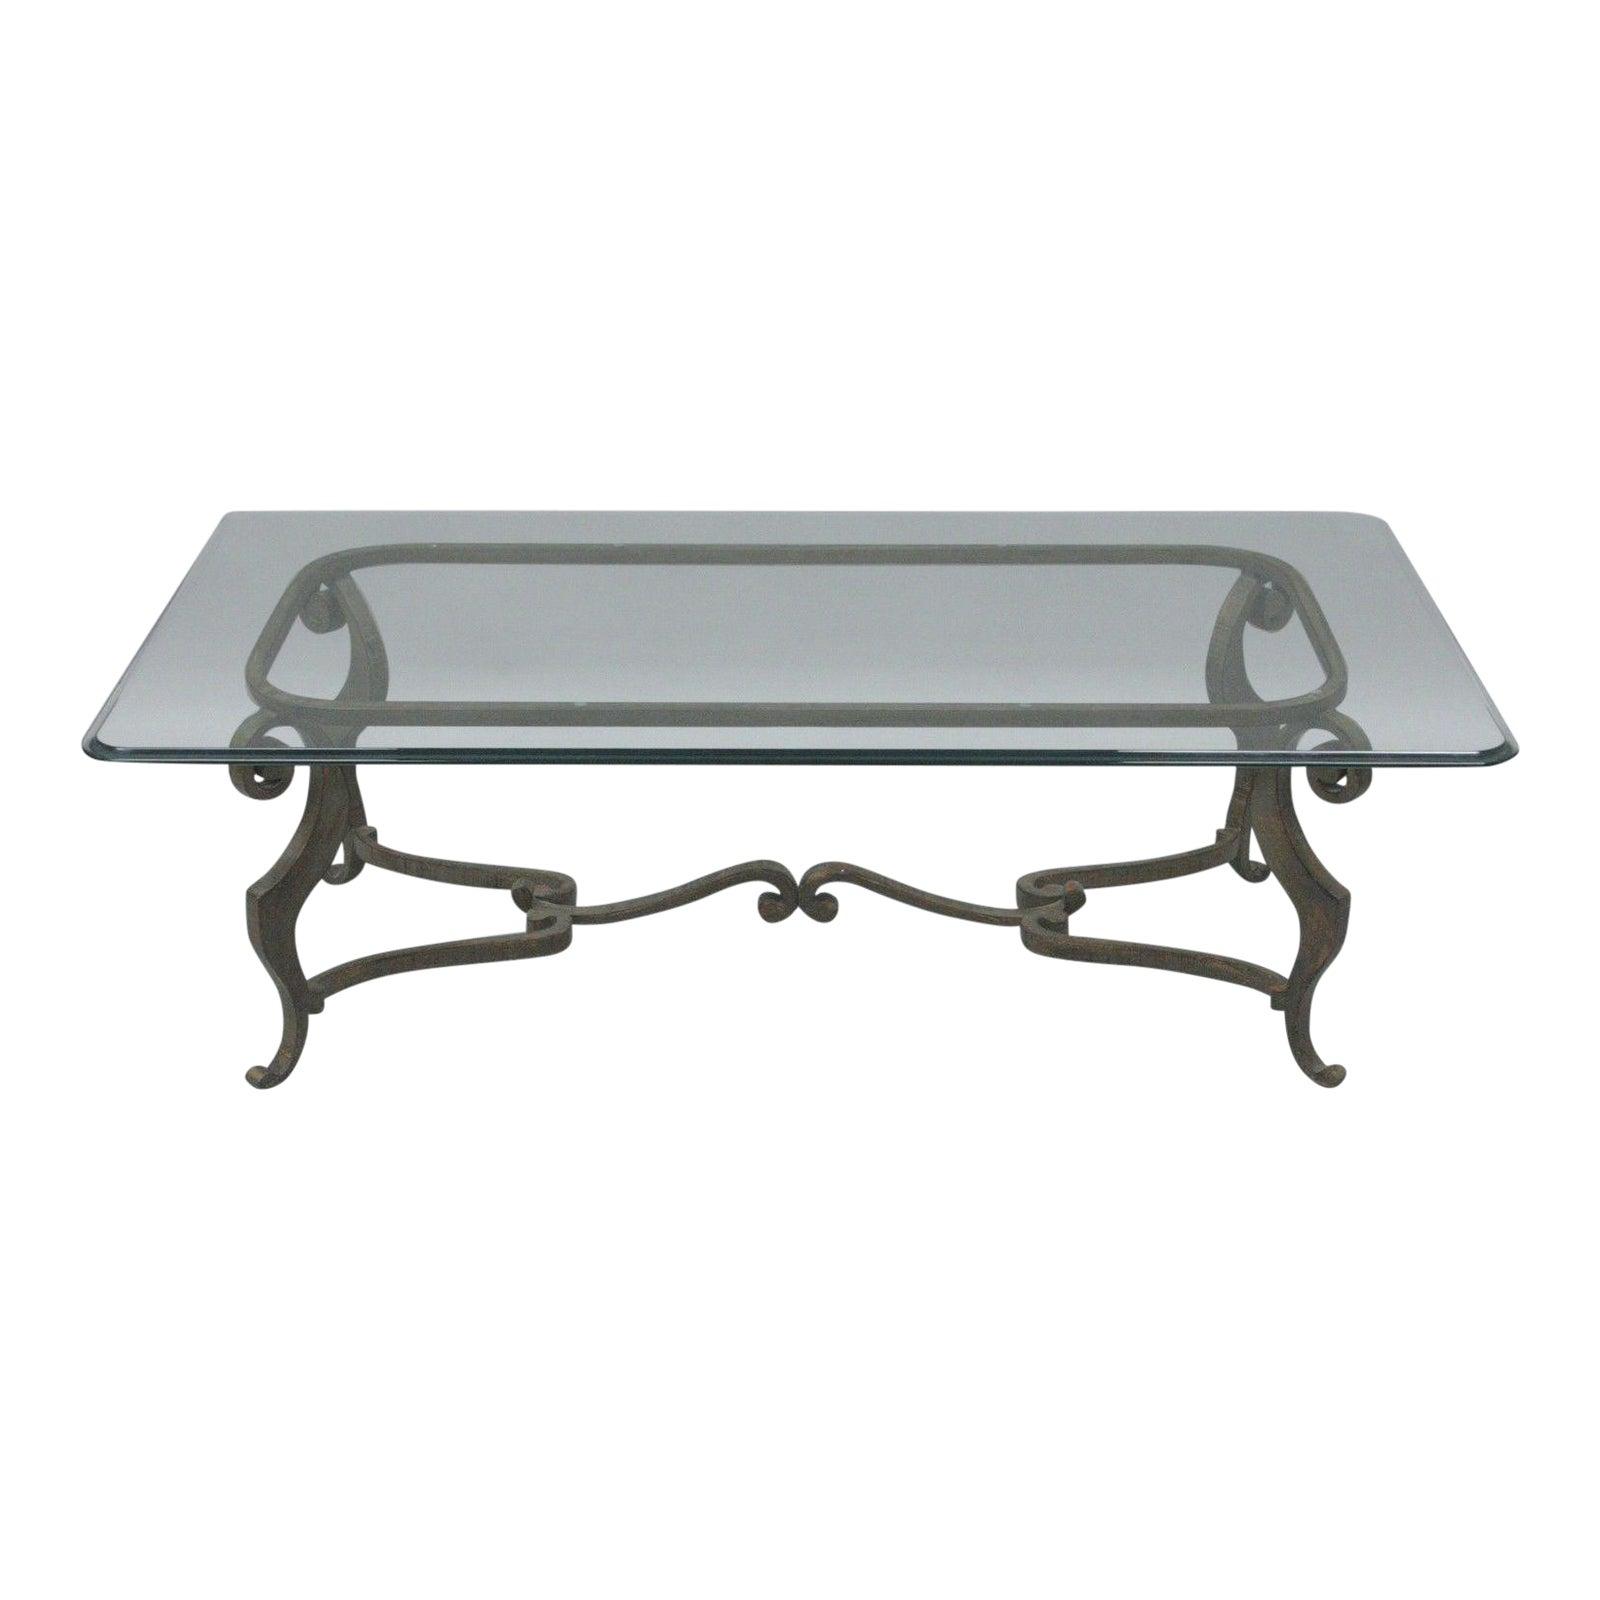 Heavy Iron Metal Scroll Decorator Coffee Table Glass Top Distressed